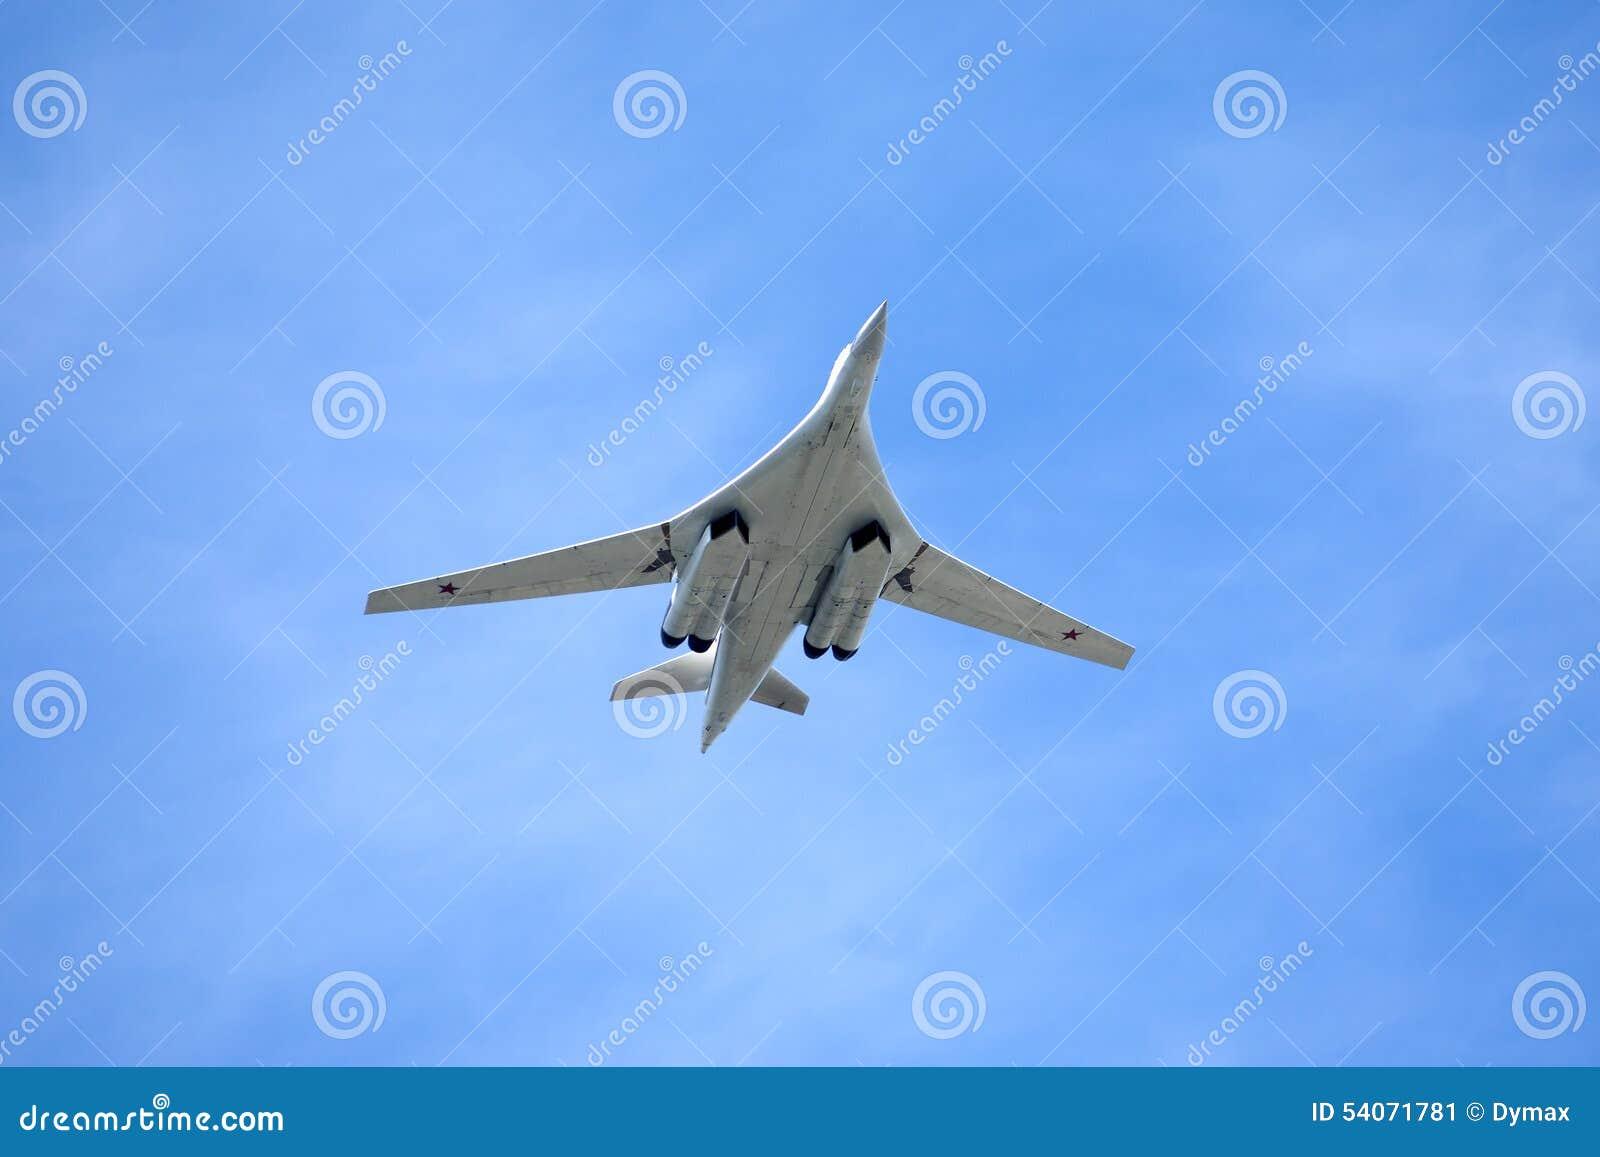 Russian Military Aircraft Tu-160 In Flight Stock Photo ... Thunderbolt Clipart